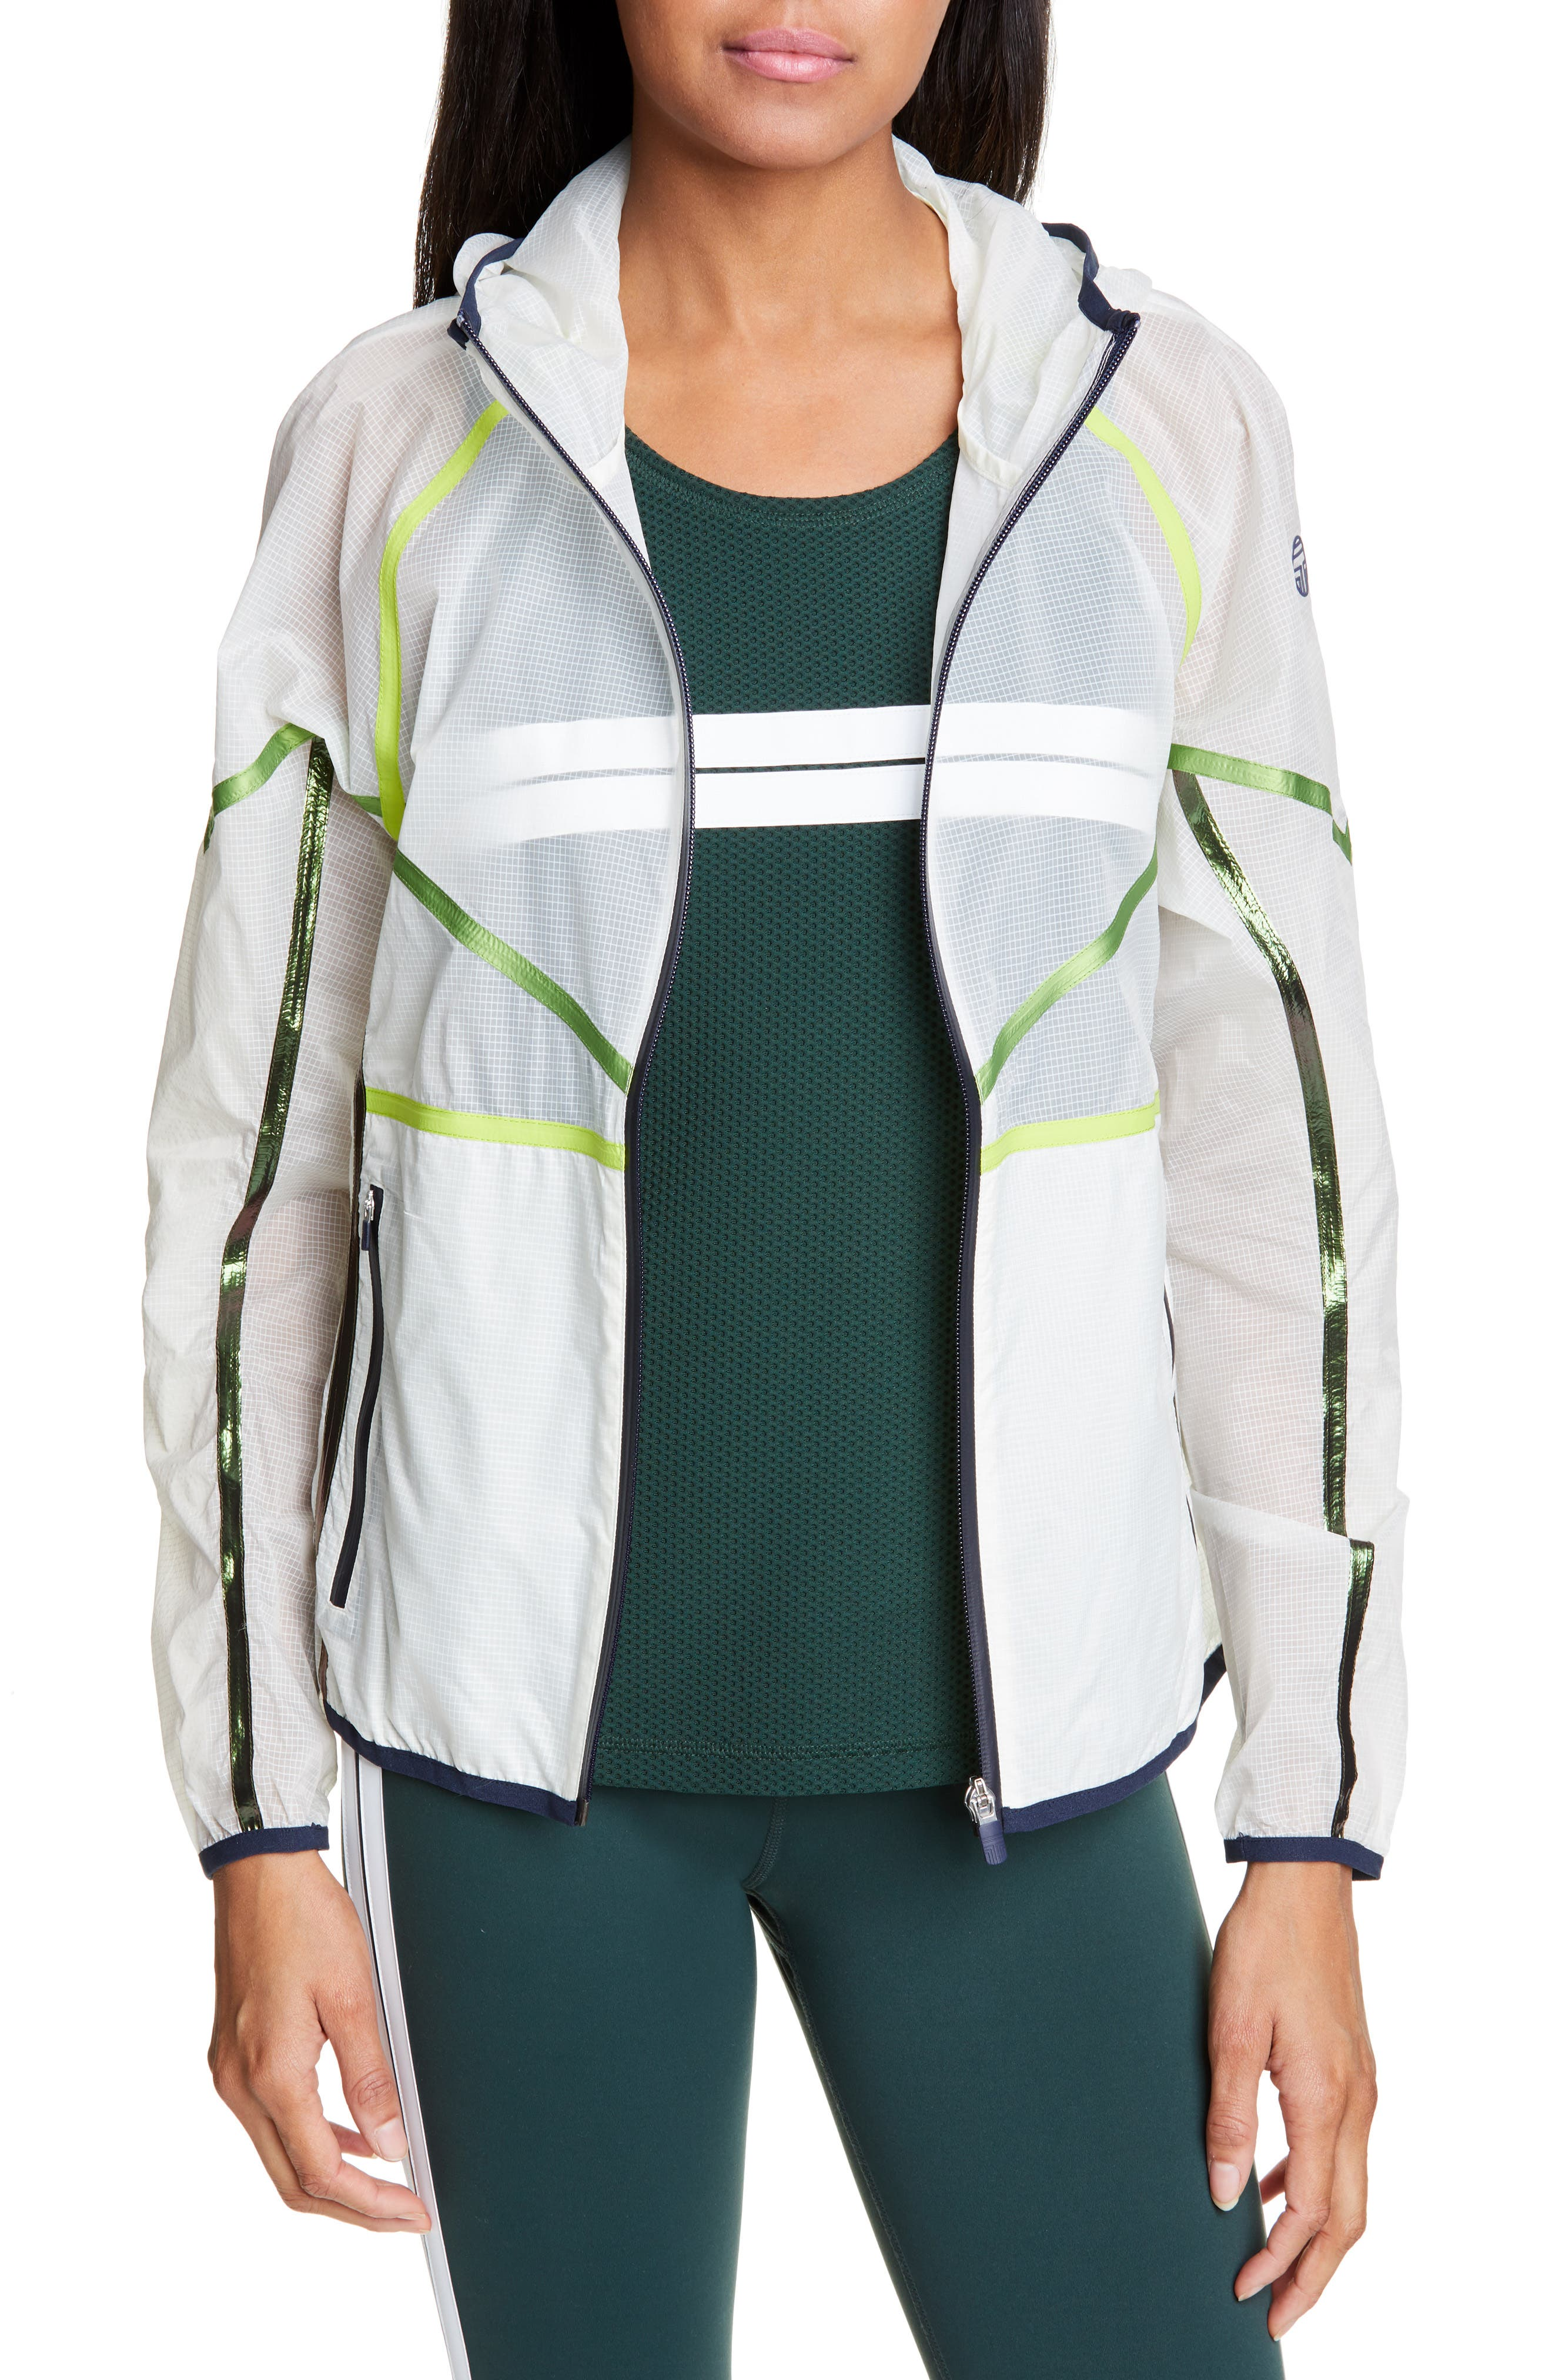 Tory Sport Coats Ripstop Nylon Hooded Running Jacket